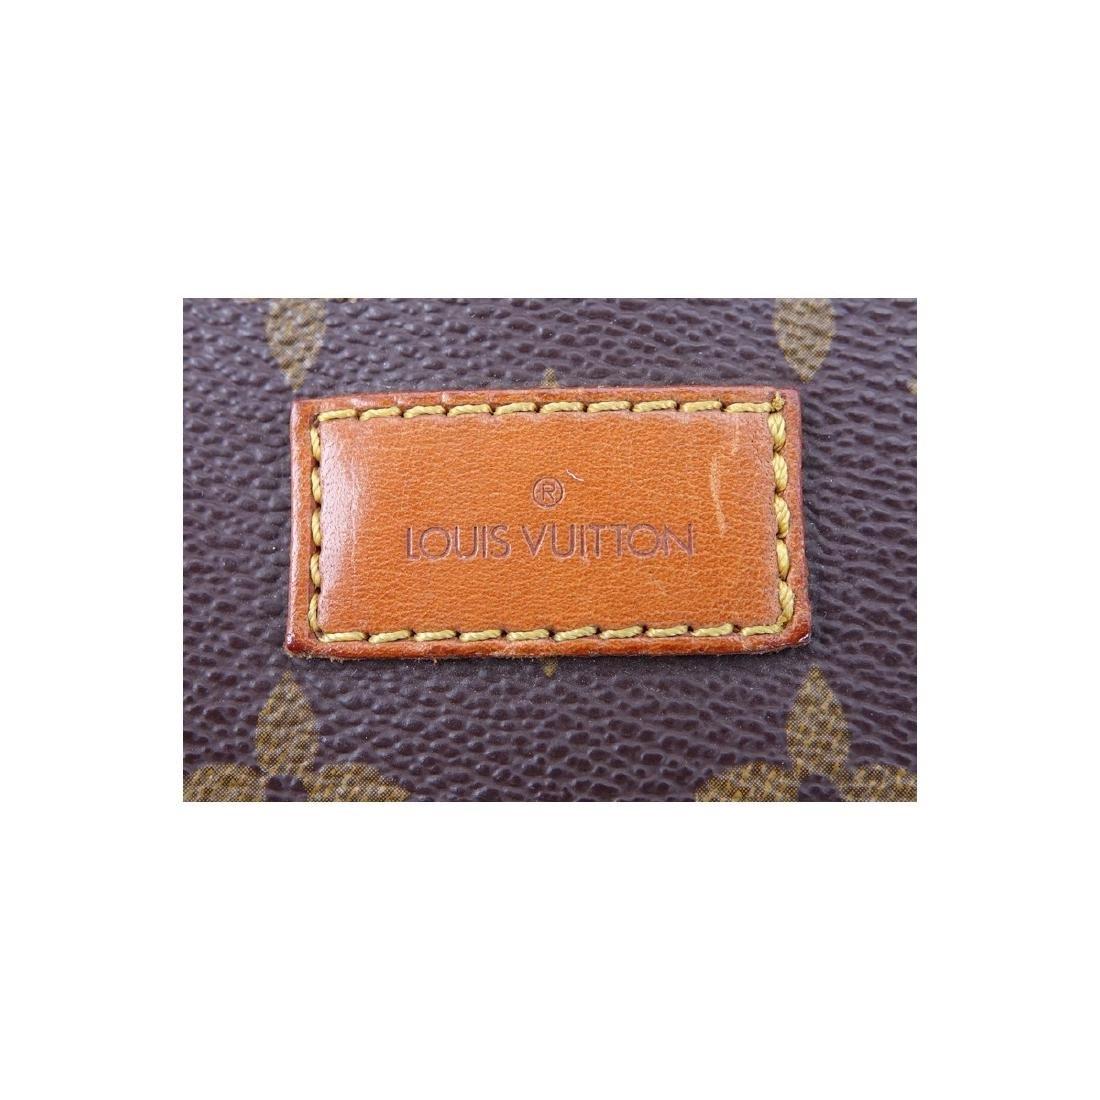 Louis Vuitton Brown Monogram Coated Canvas Saumur - 7